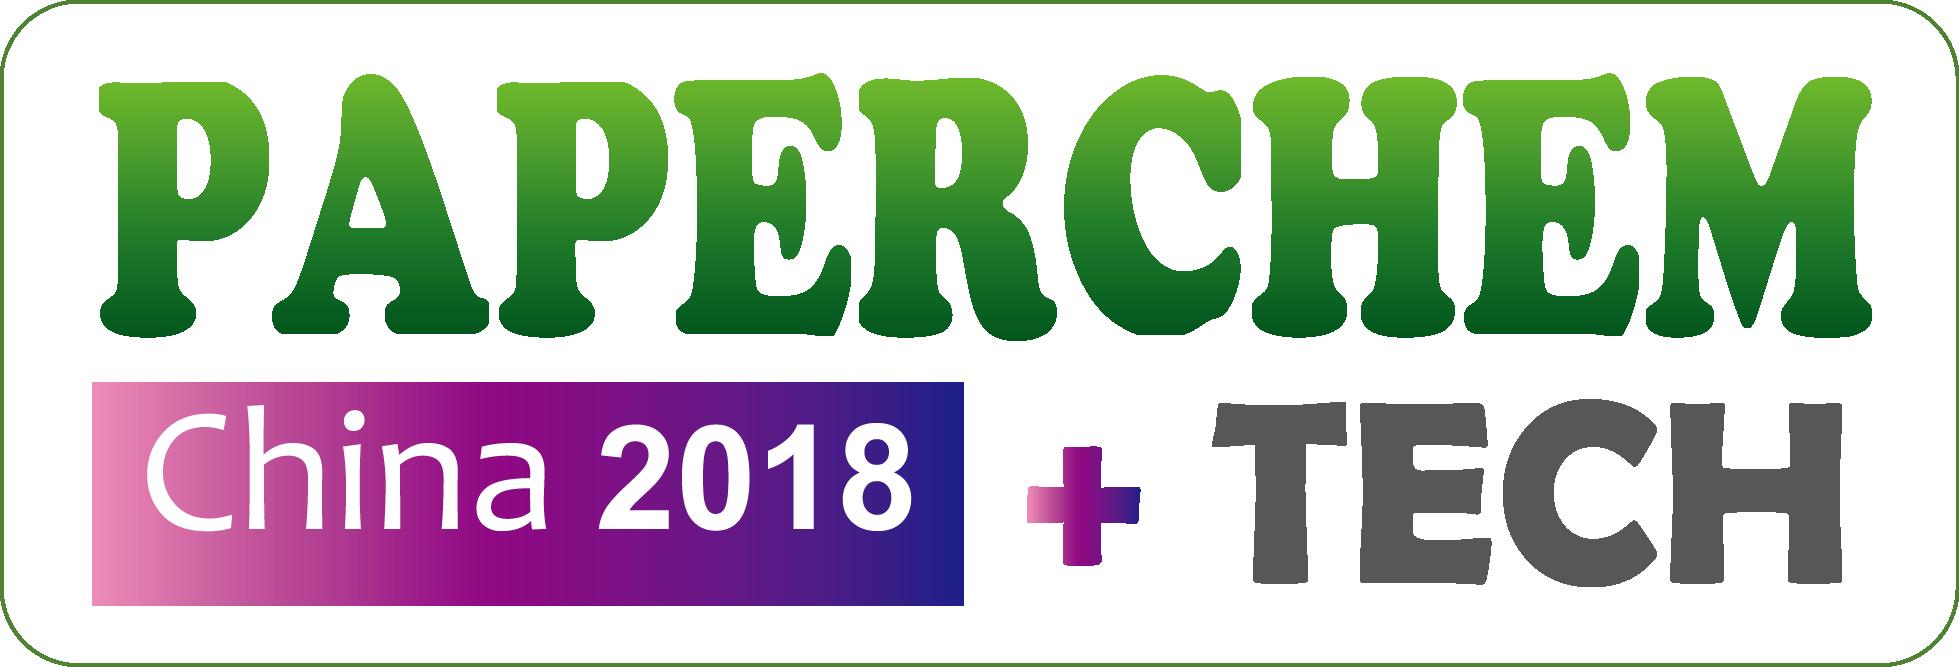 logoPAPERCHEM-2018.png